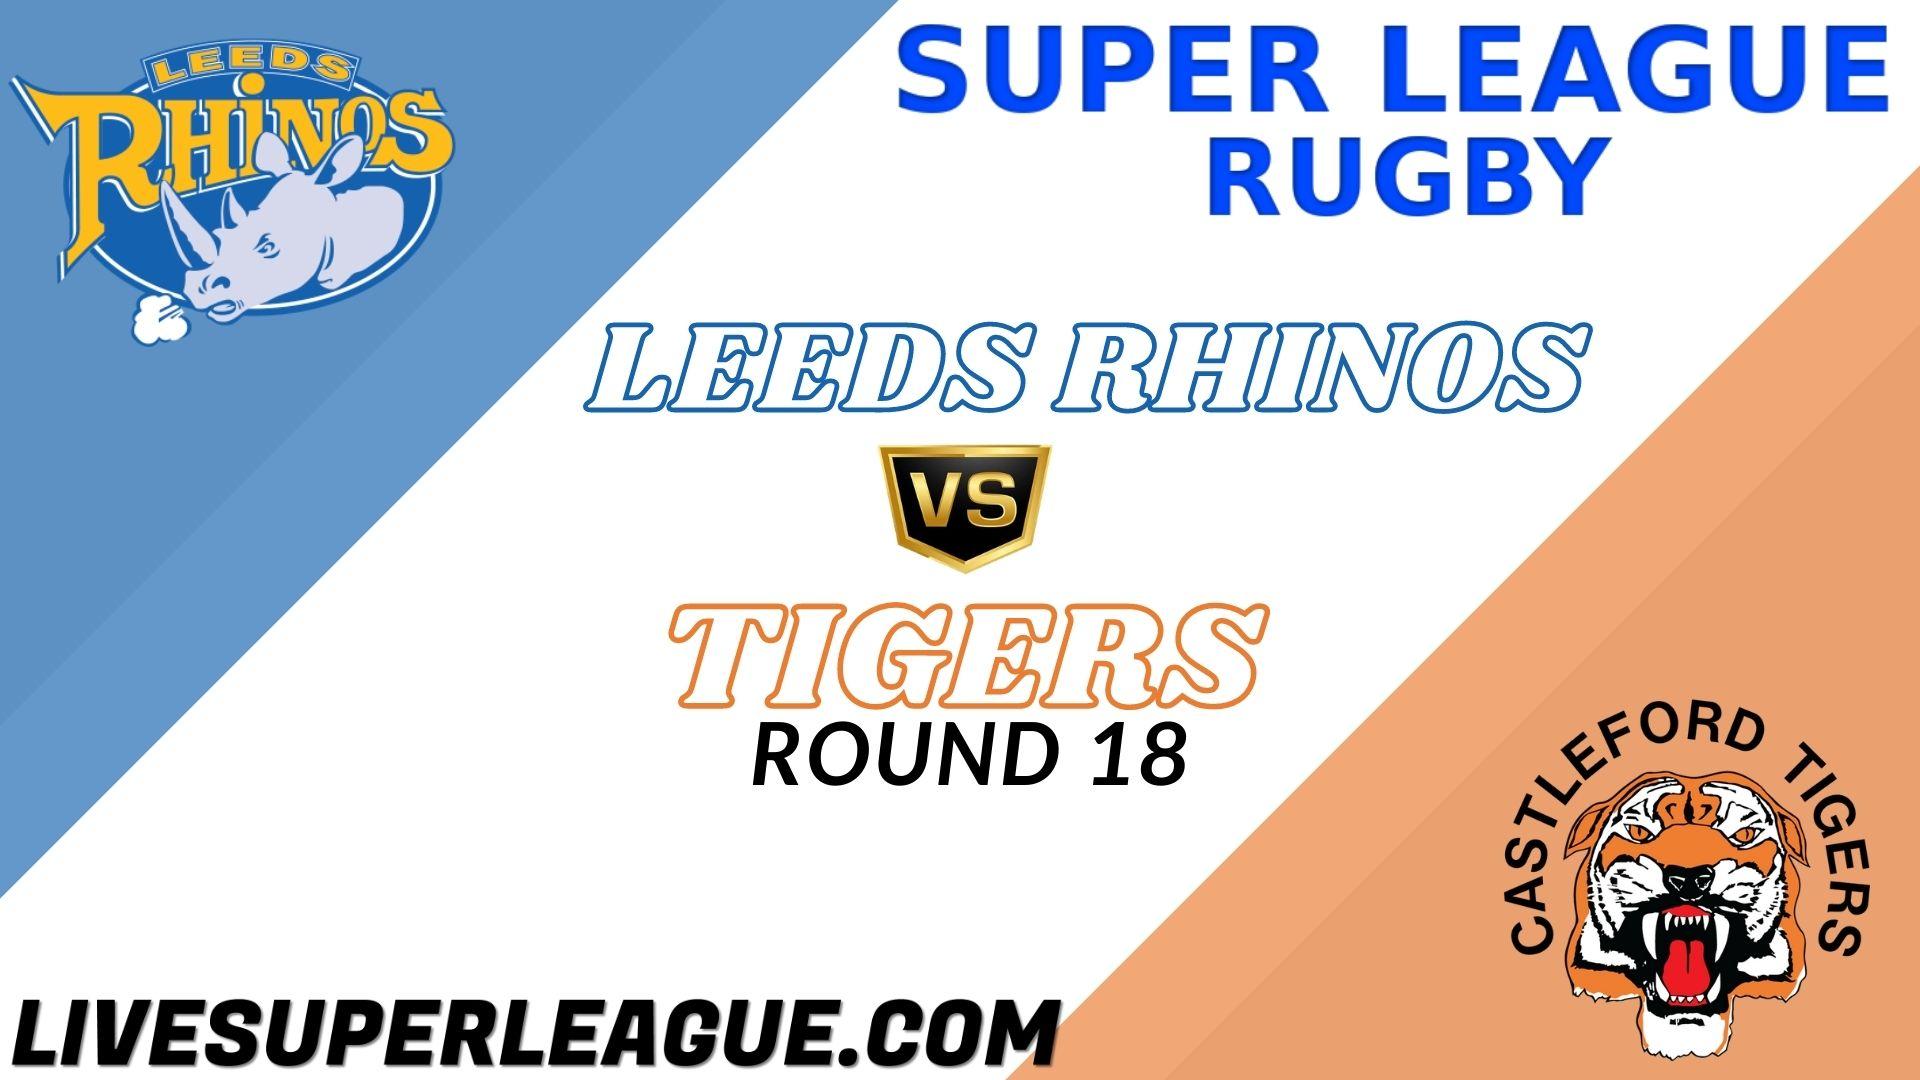 Leeds Rhinos Vs Tigers RD 18 Live Stream 2021 | Full Match Replay